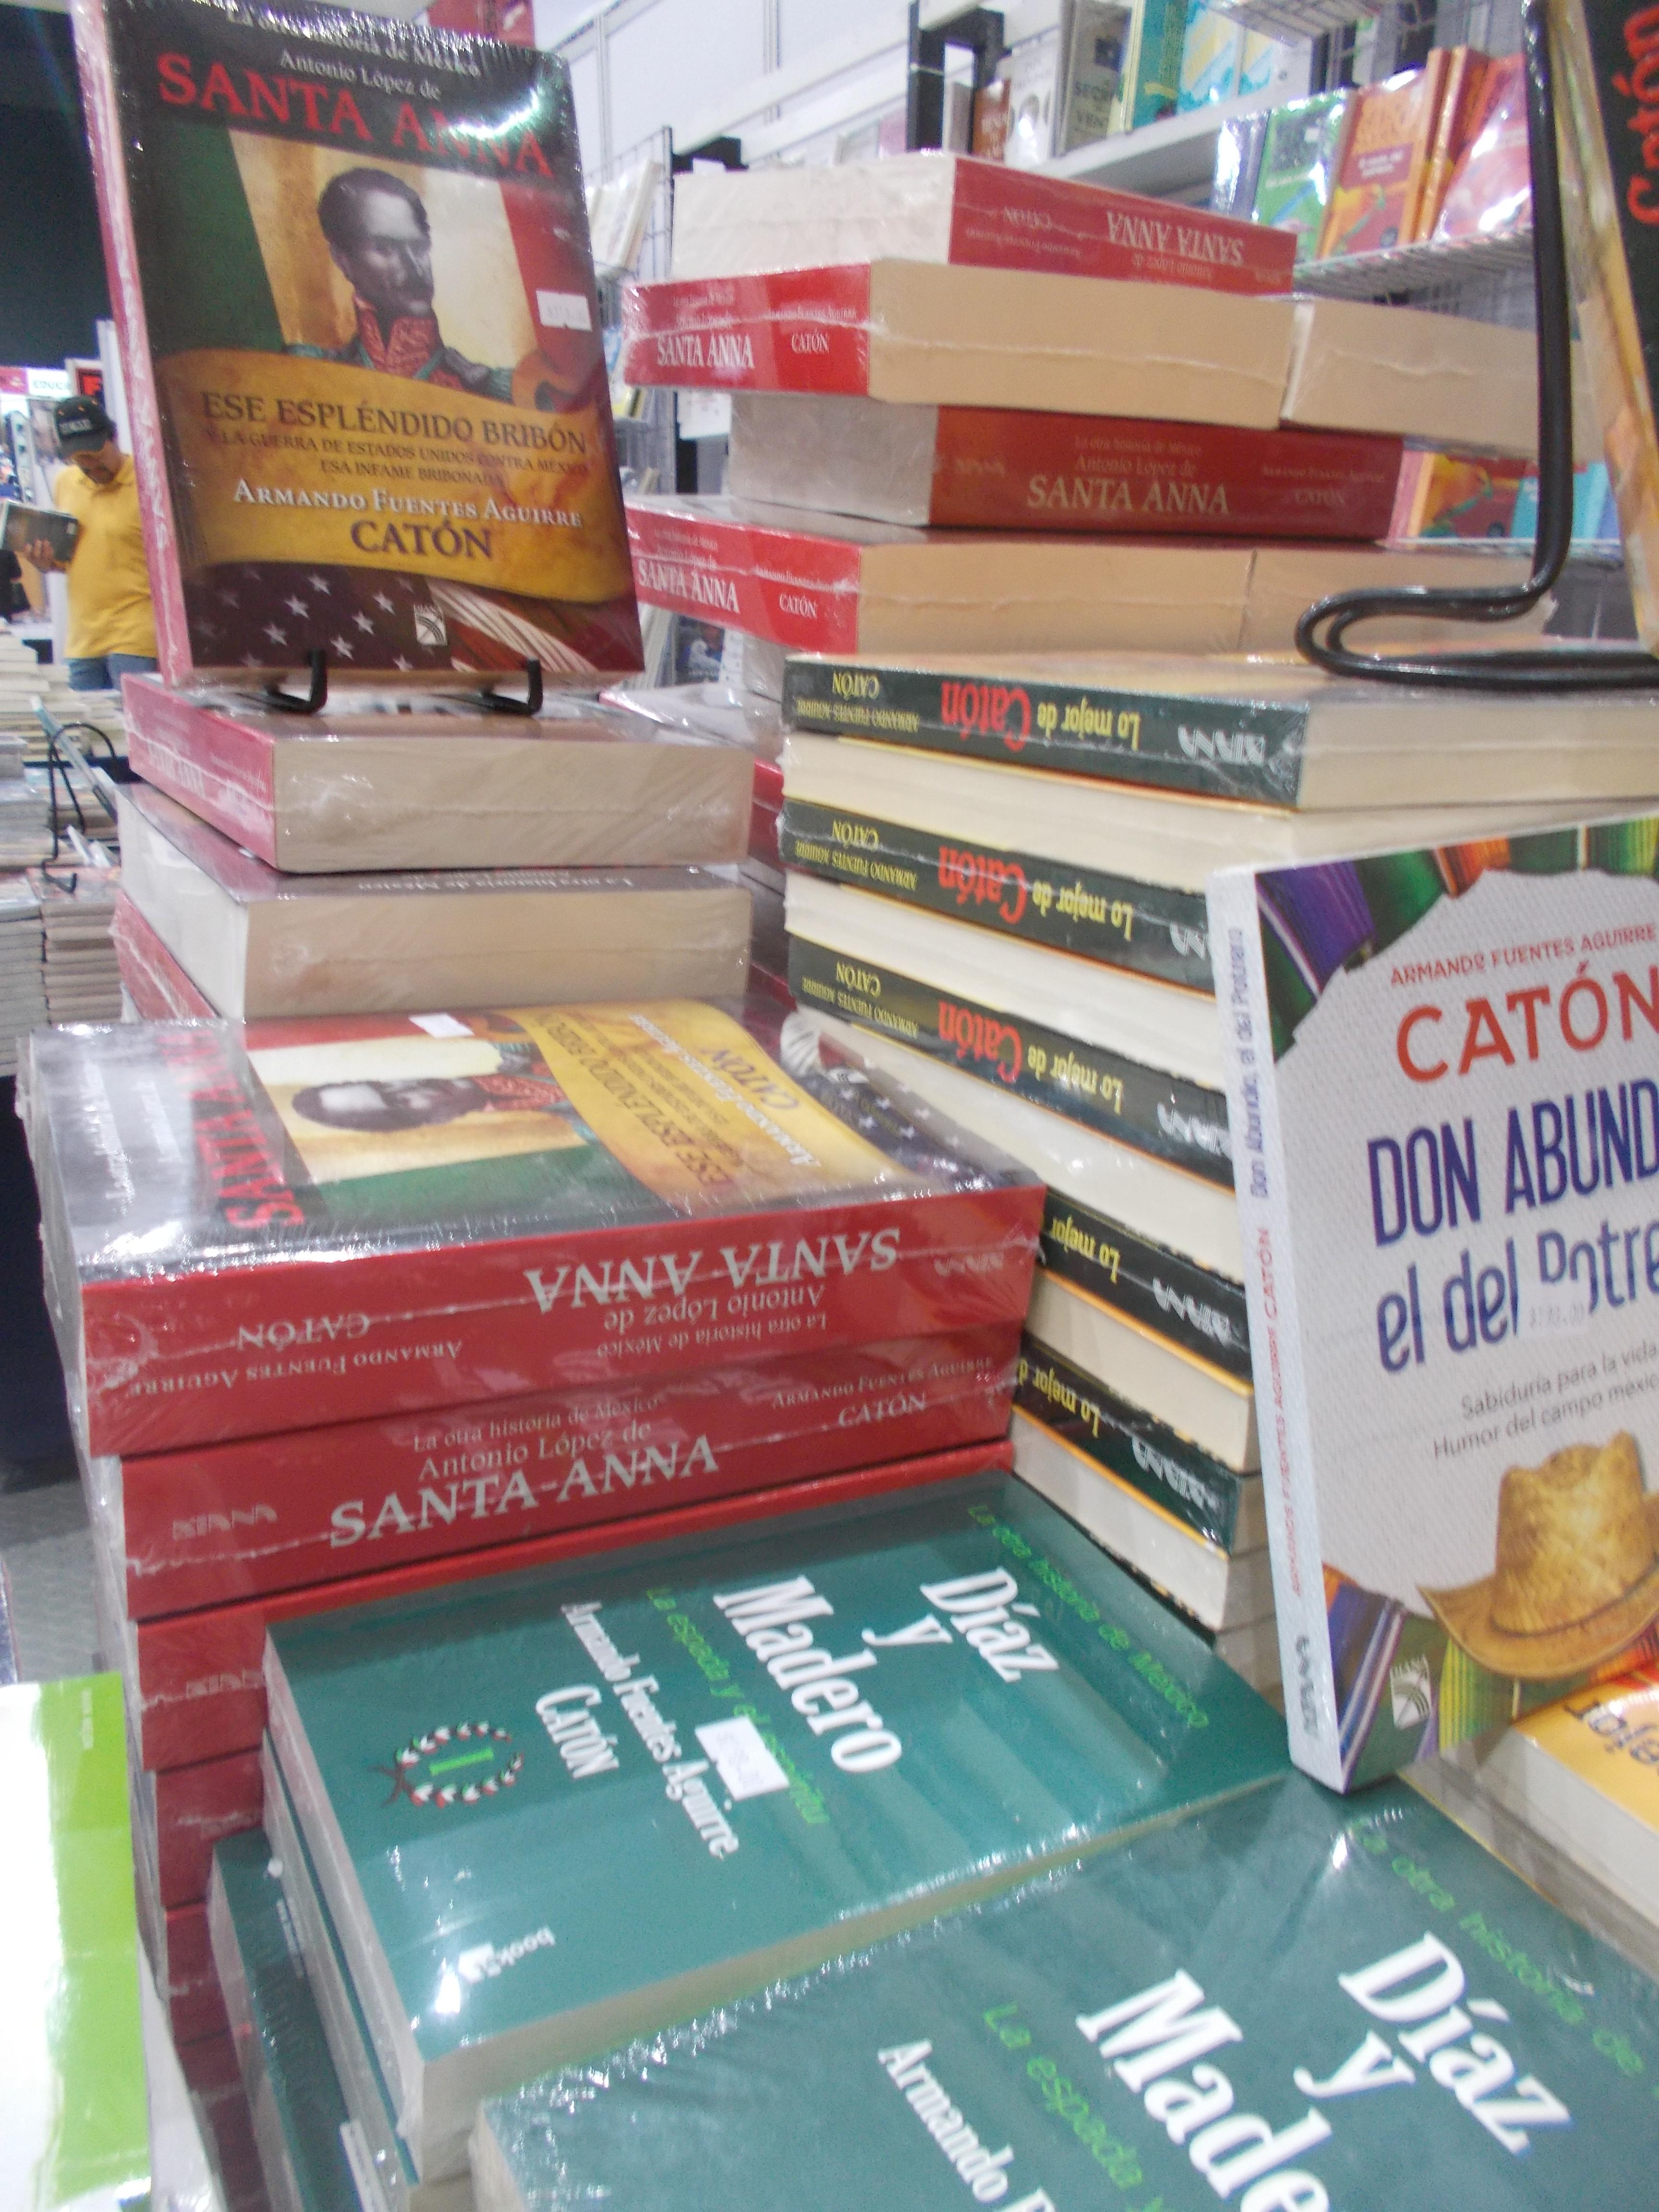 Caton's books